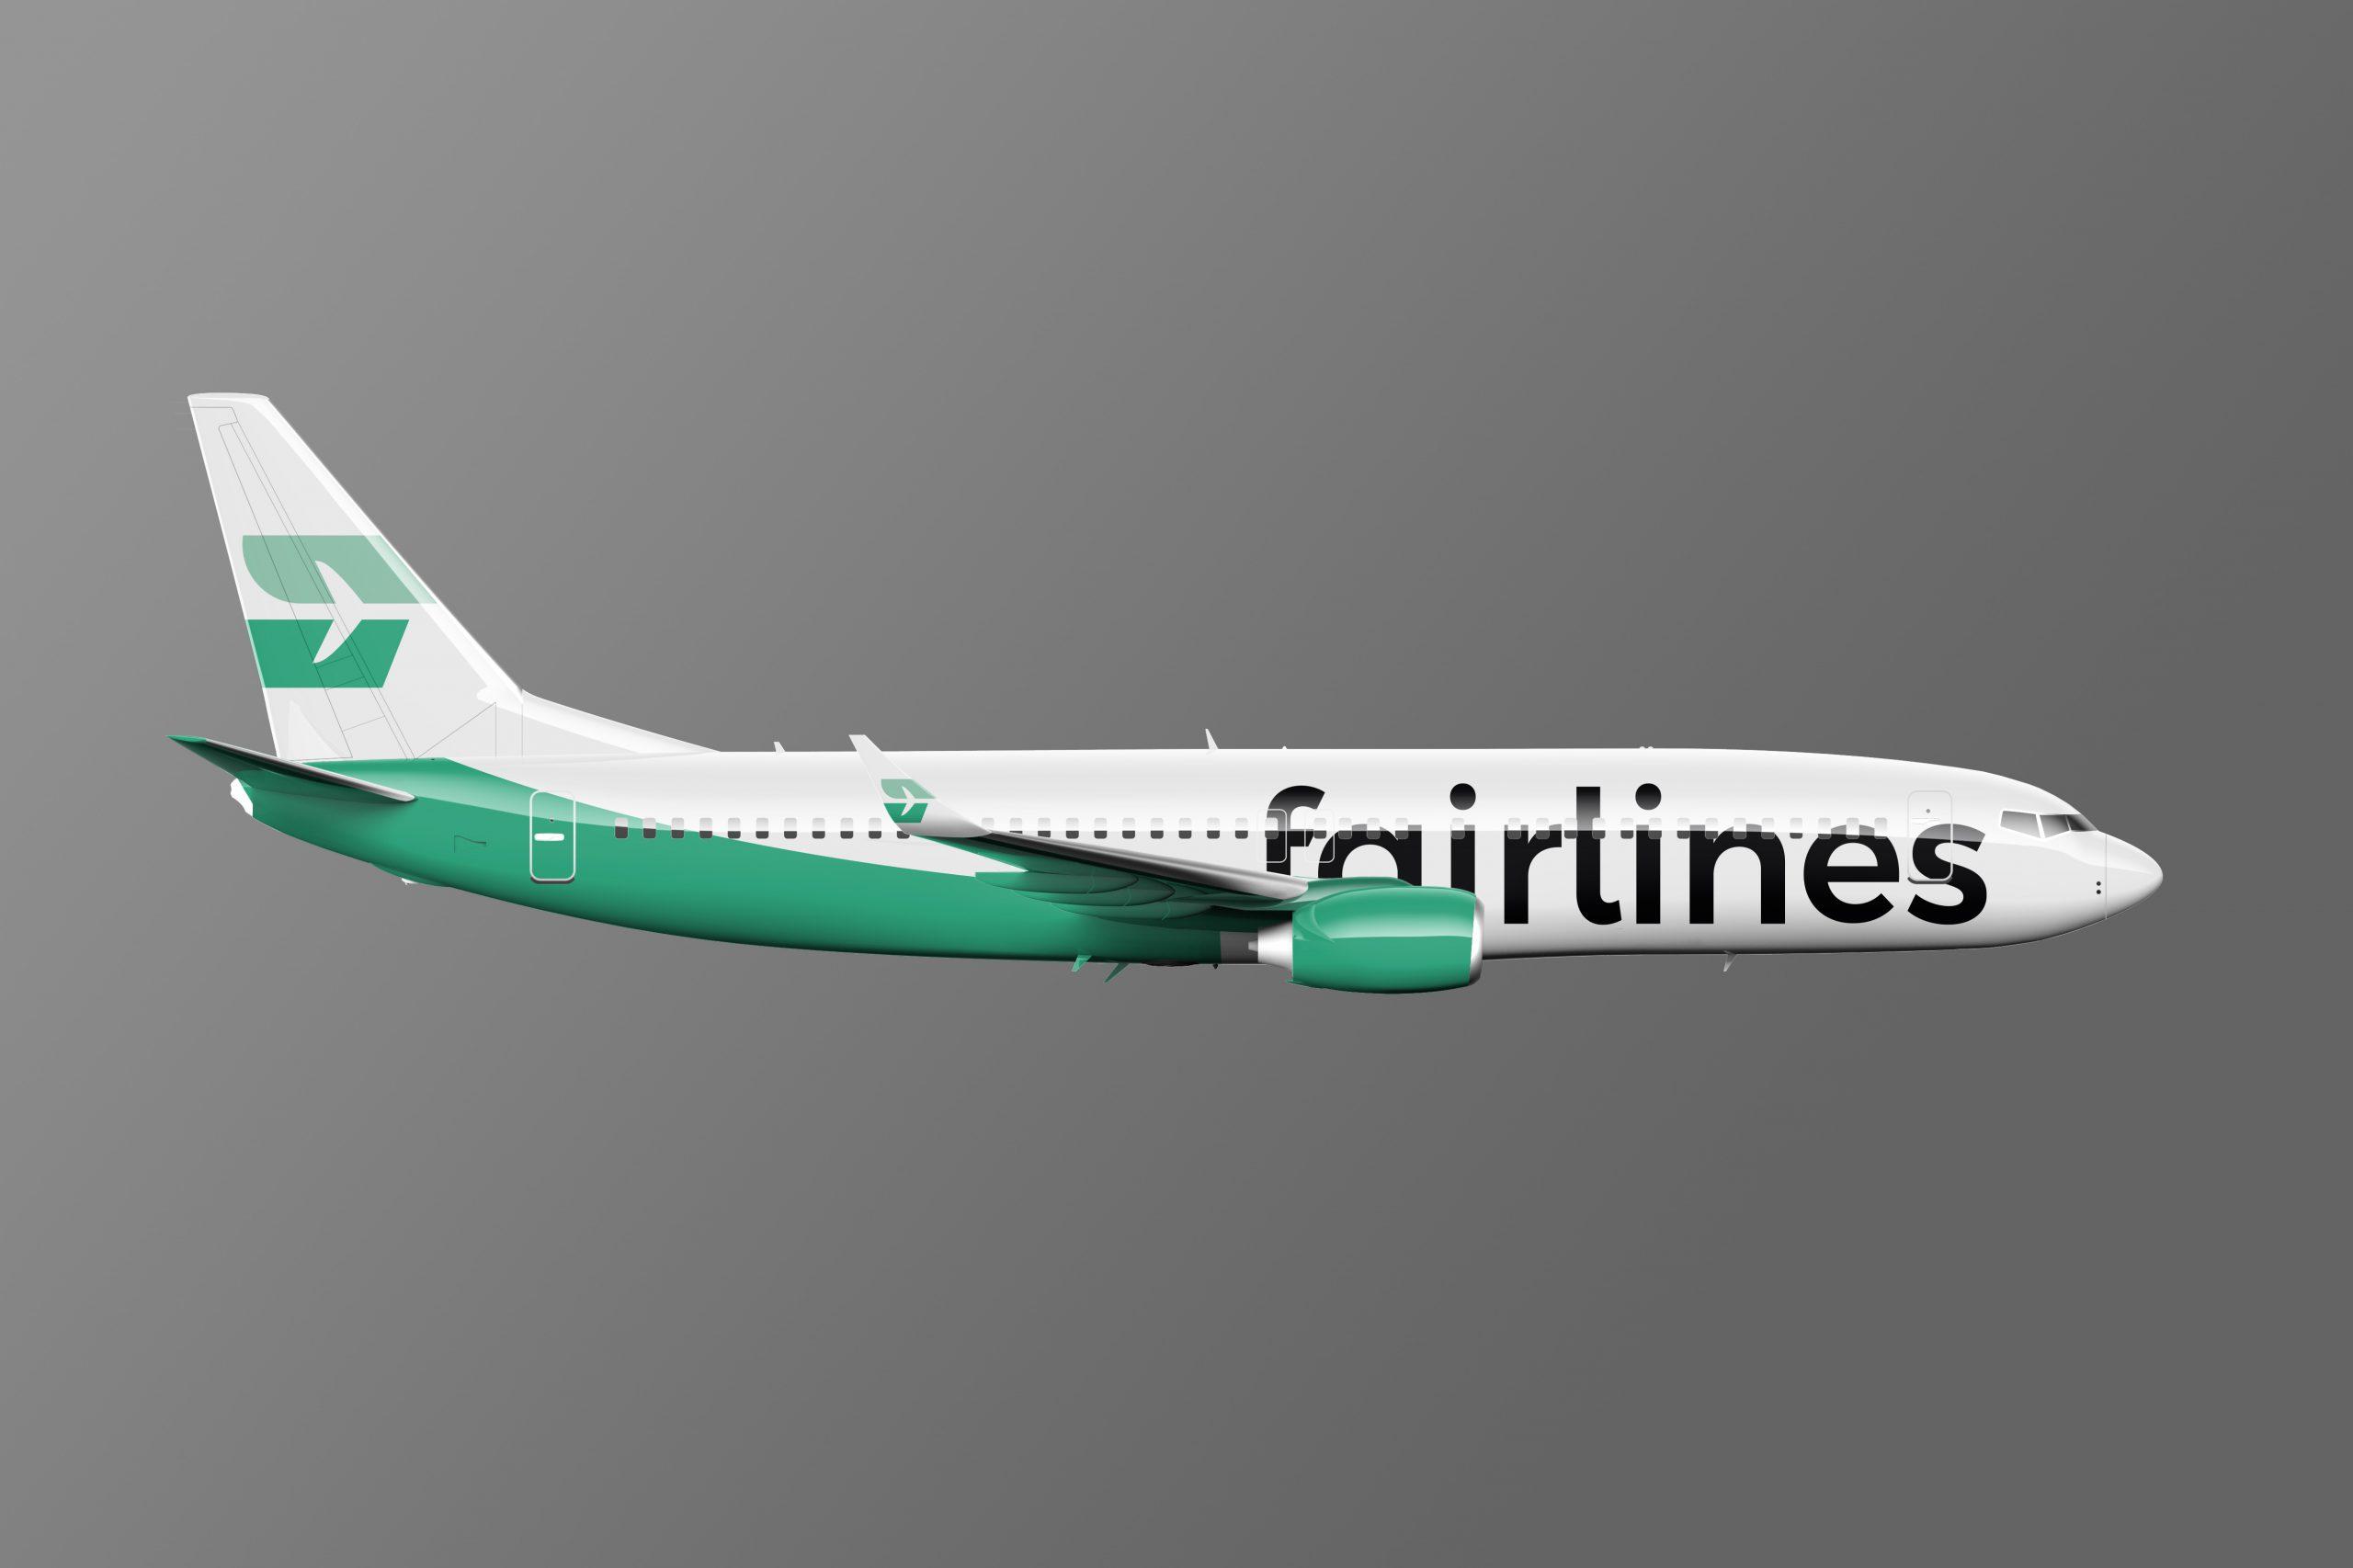 fairlines_corporatevehicle